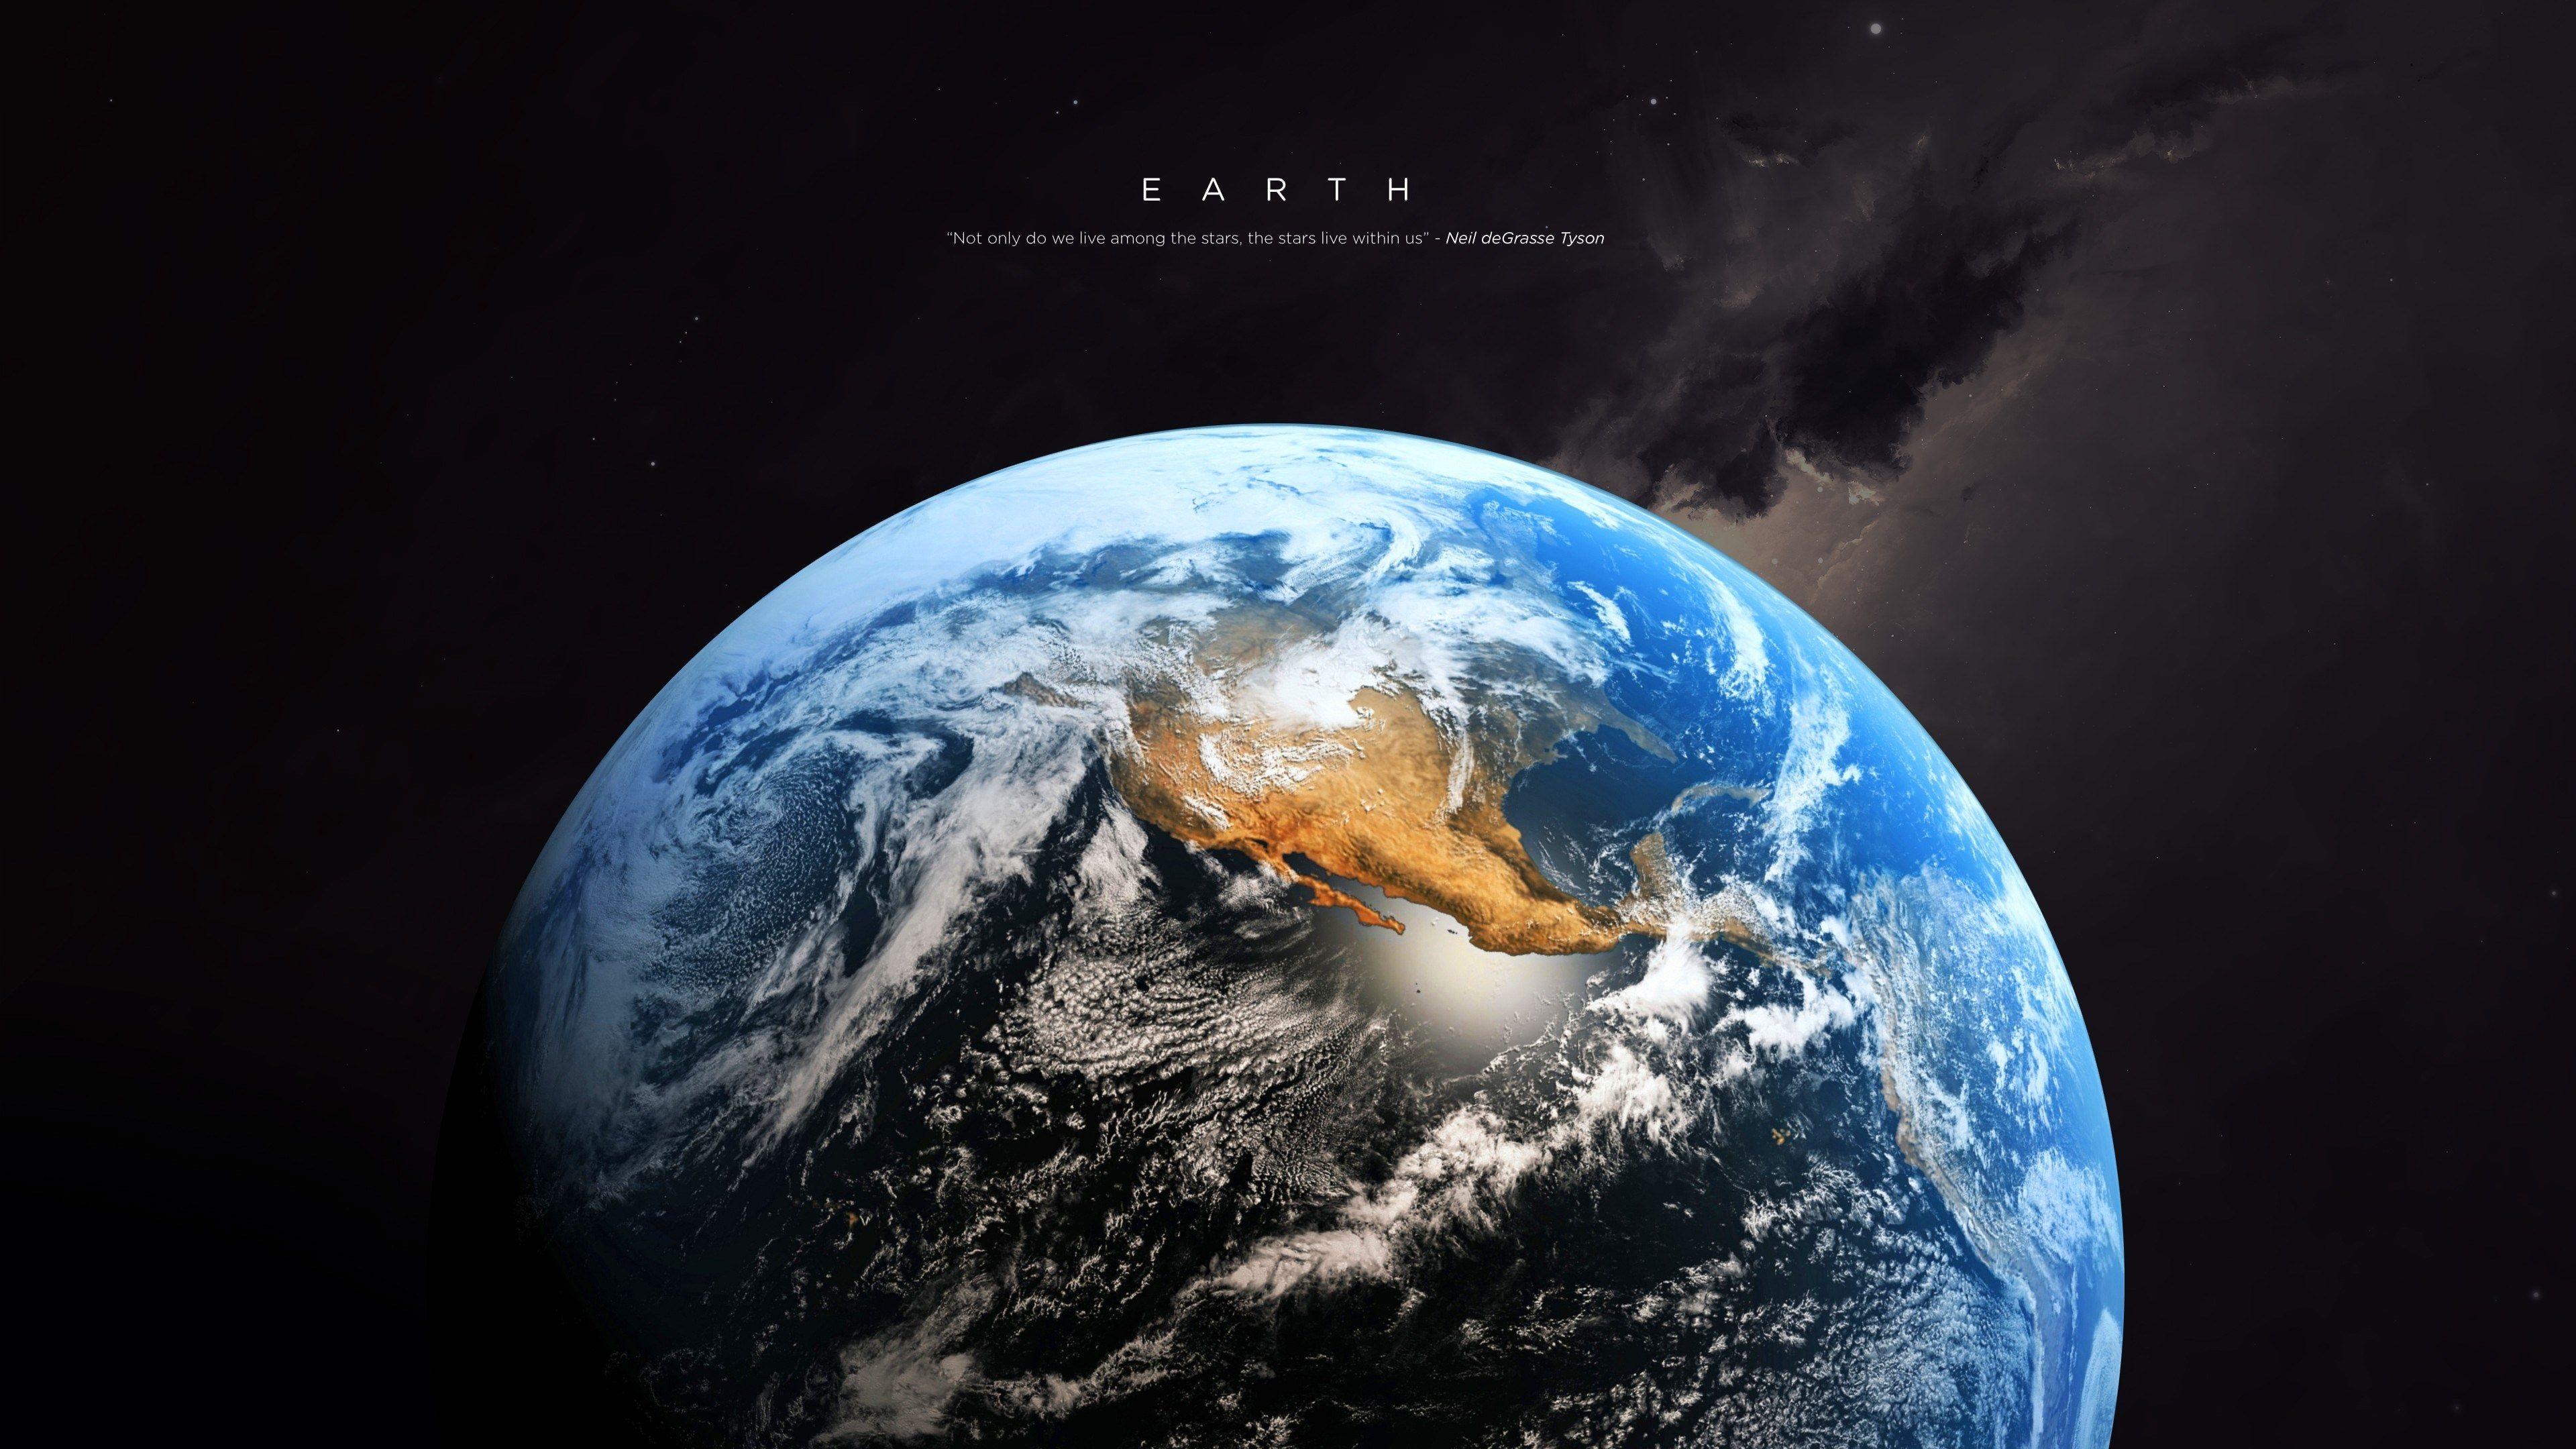 3840x2160 Earth 4k Cool Wallpaper Pc Earth Hd Space Art Wallpaper Earth Earth hd wallpaper download